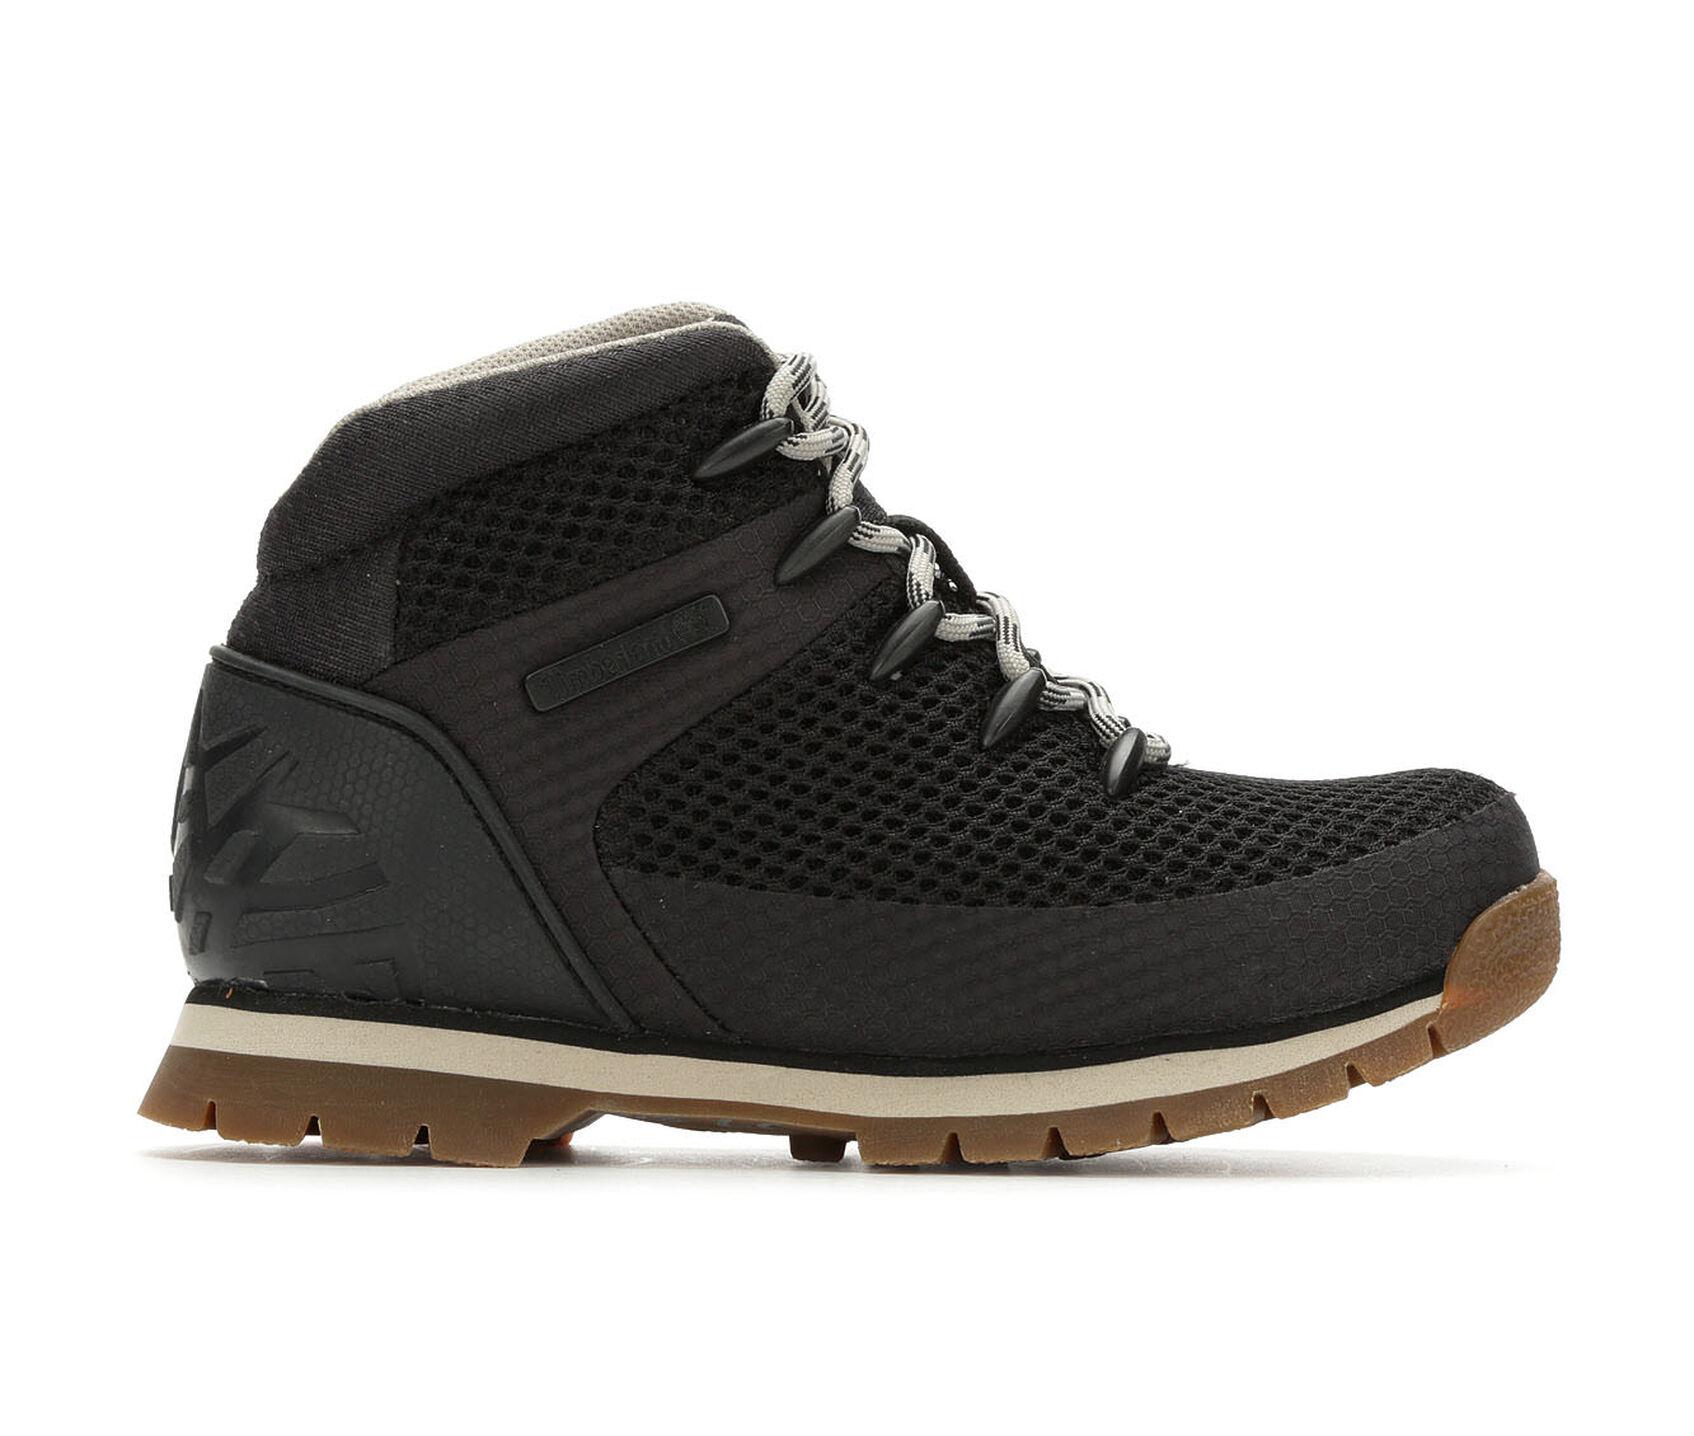 2d366bfe895 ... Timberland Big Kid Eurosprint Hiker Boots. Previous